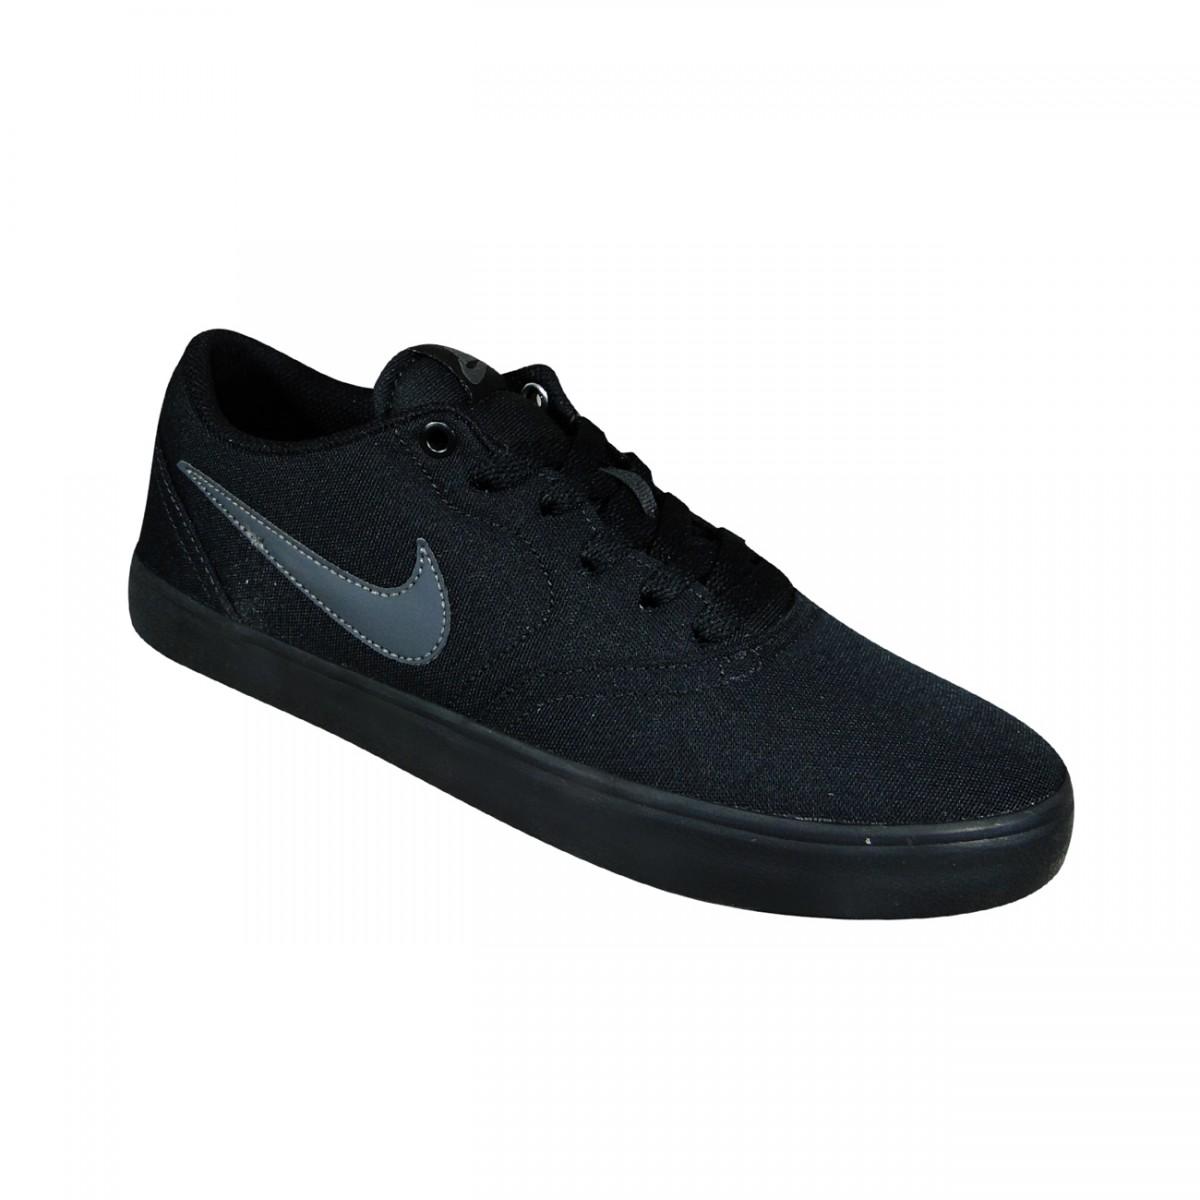 ab96e95b218 Tenis Nike Team Hustle D8 TD Infantil 881943 001 - Preto Preto Prata ...